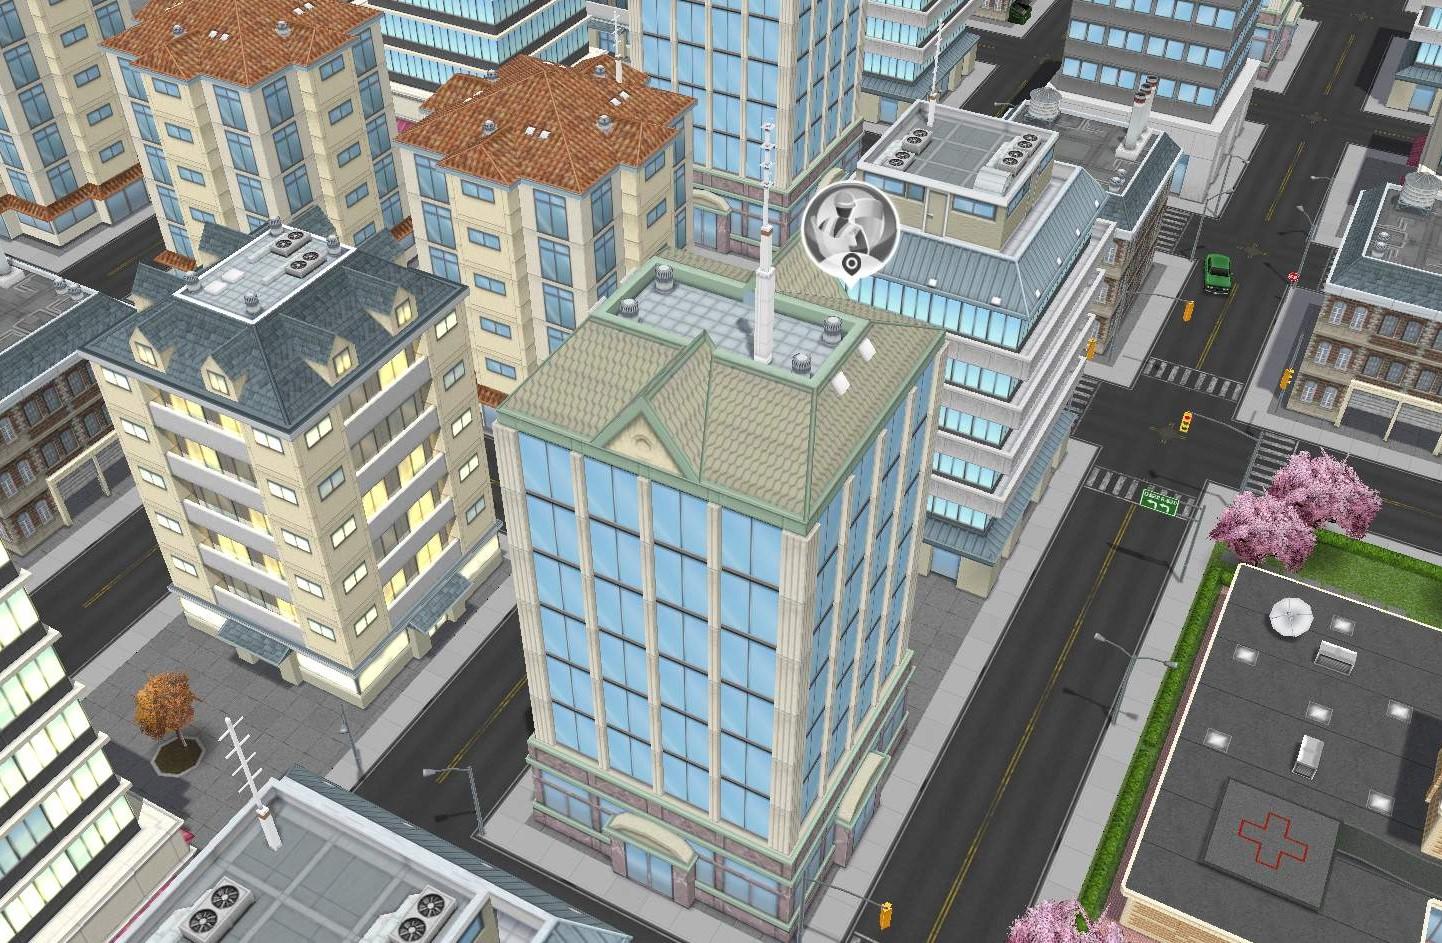 The Sims Freeplay It Edilizia In Centro